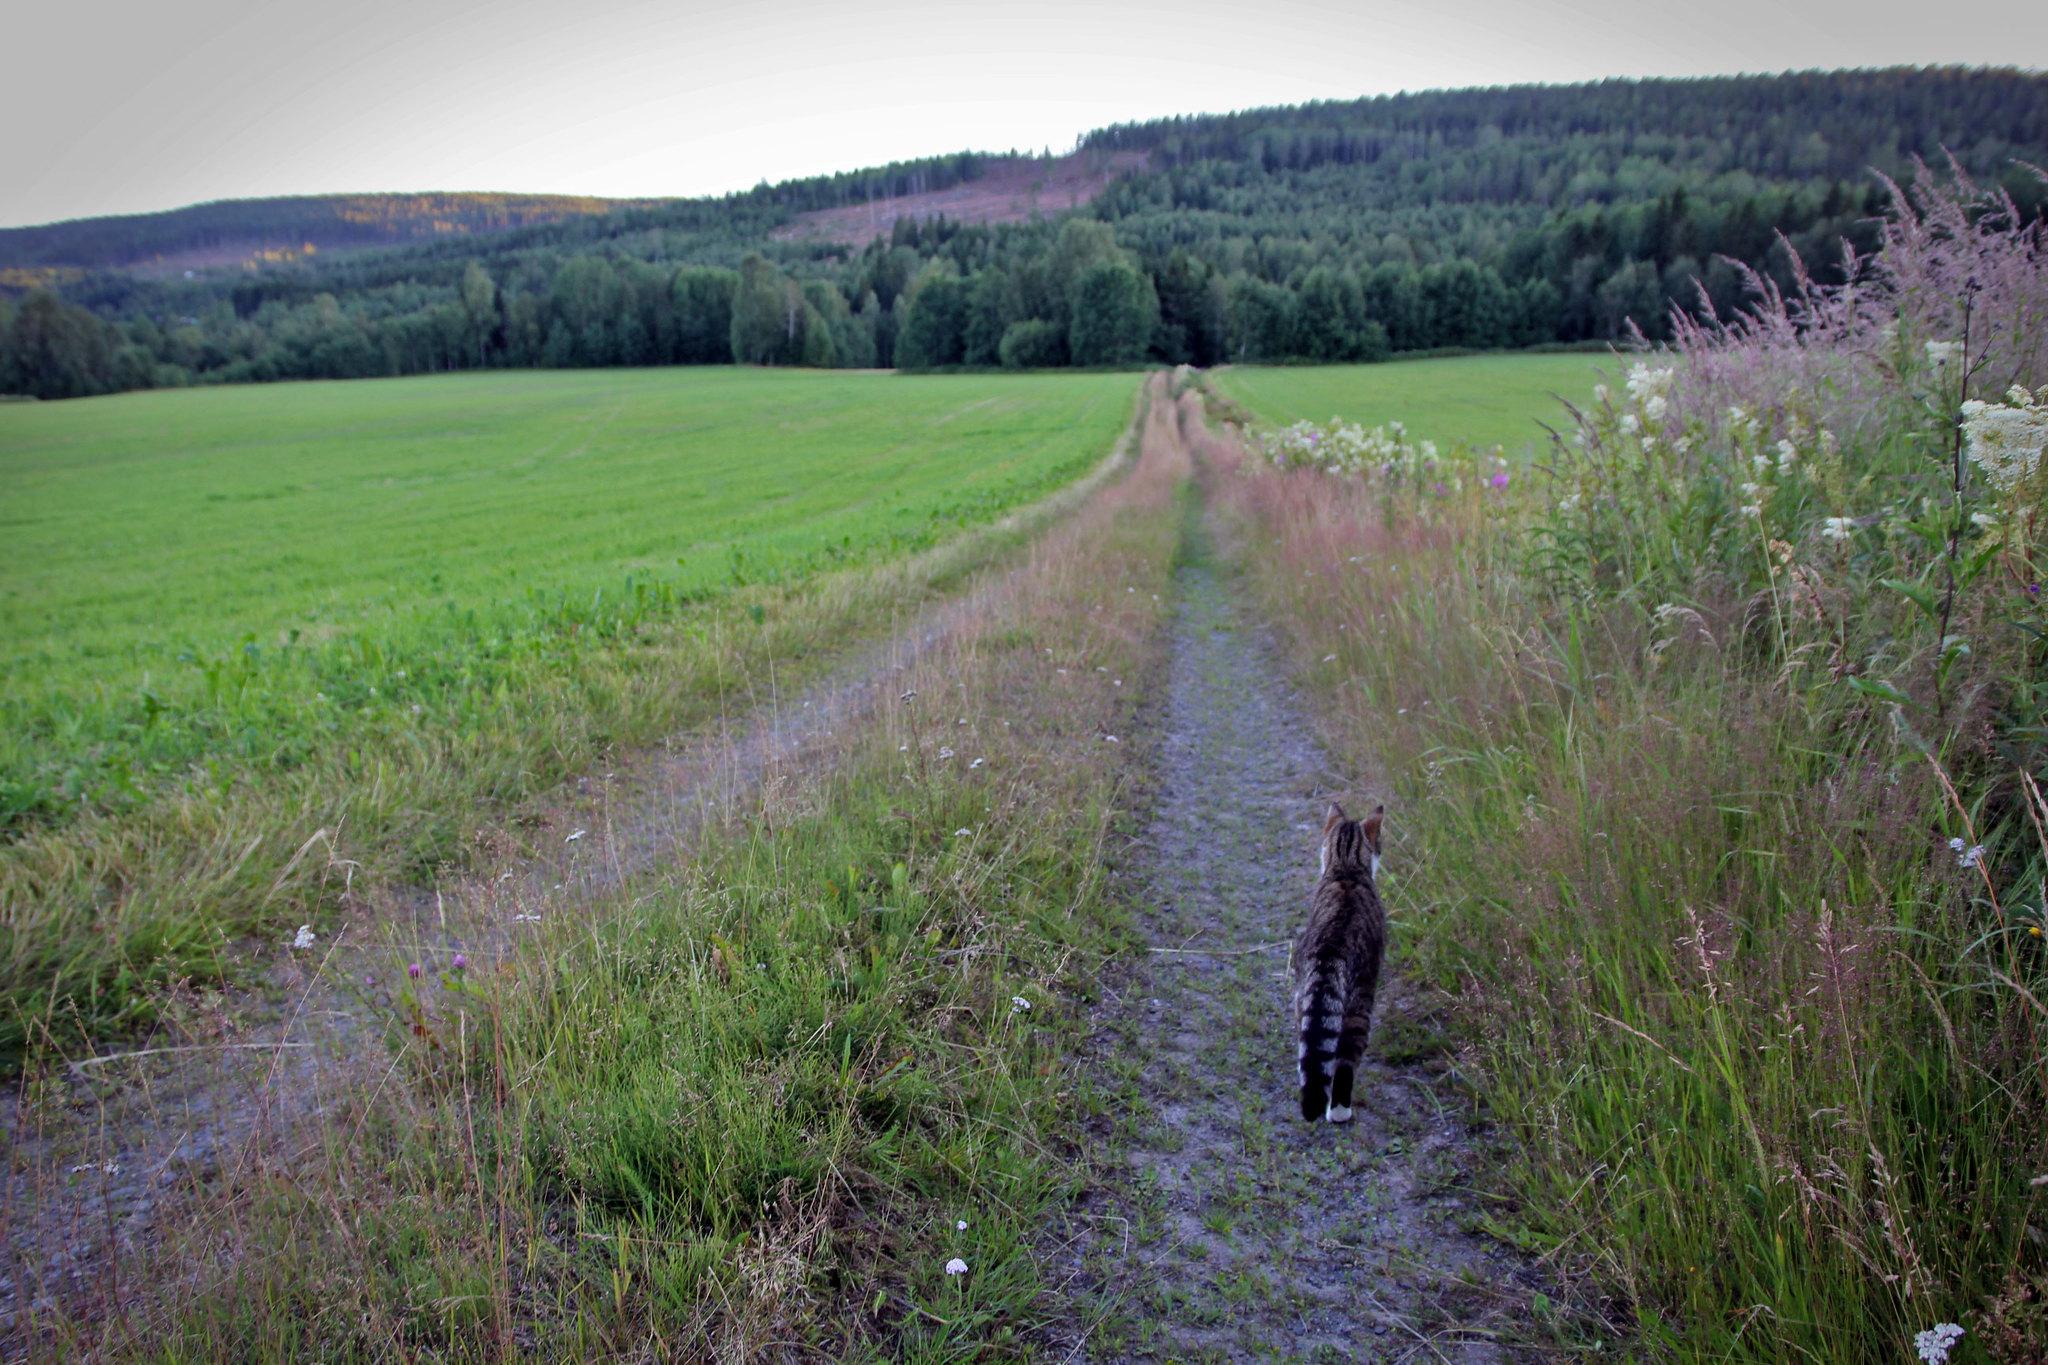 Katt på promenad :: Hej Emmisen